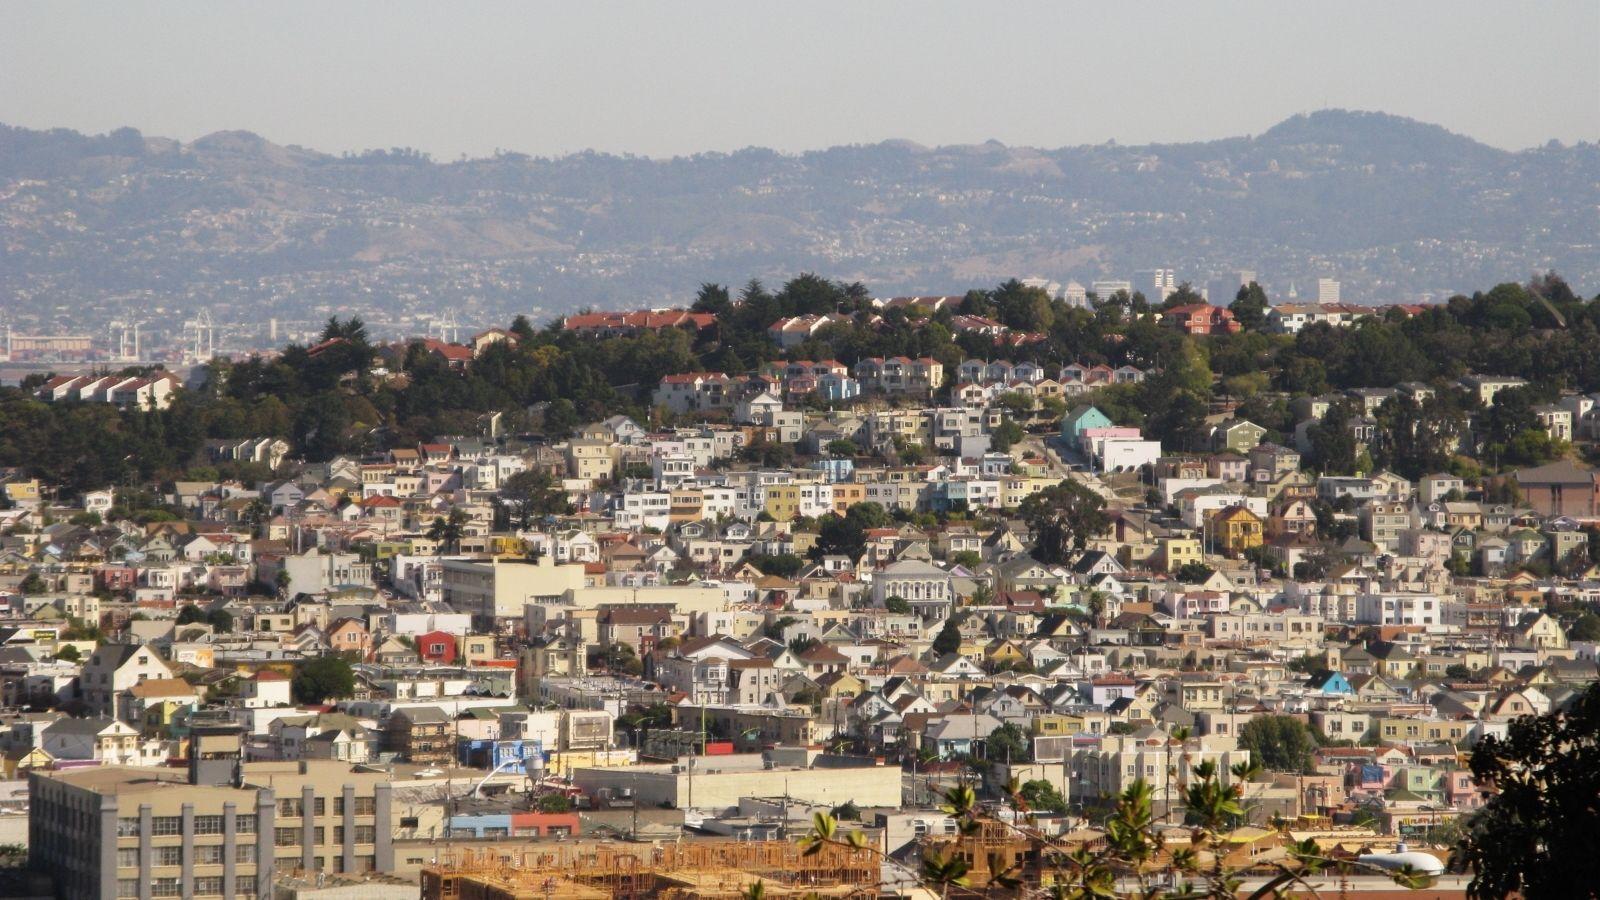 Real Estate Market Report San Mateo County Area -February 2021